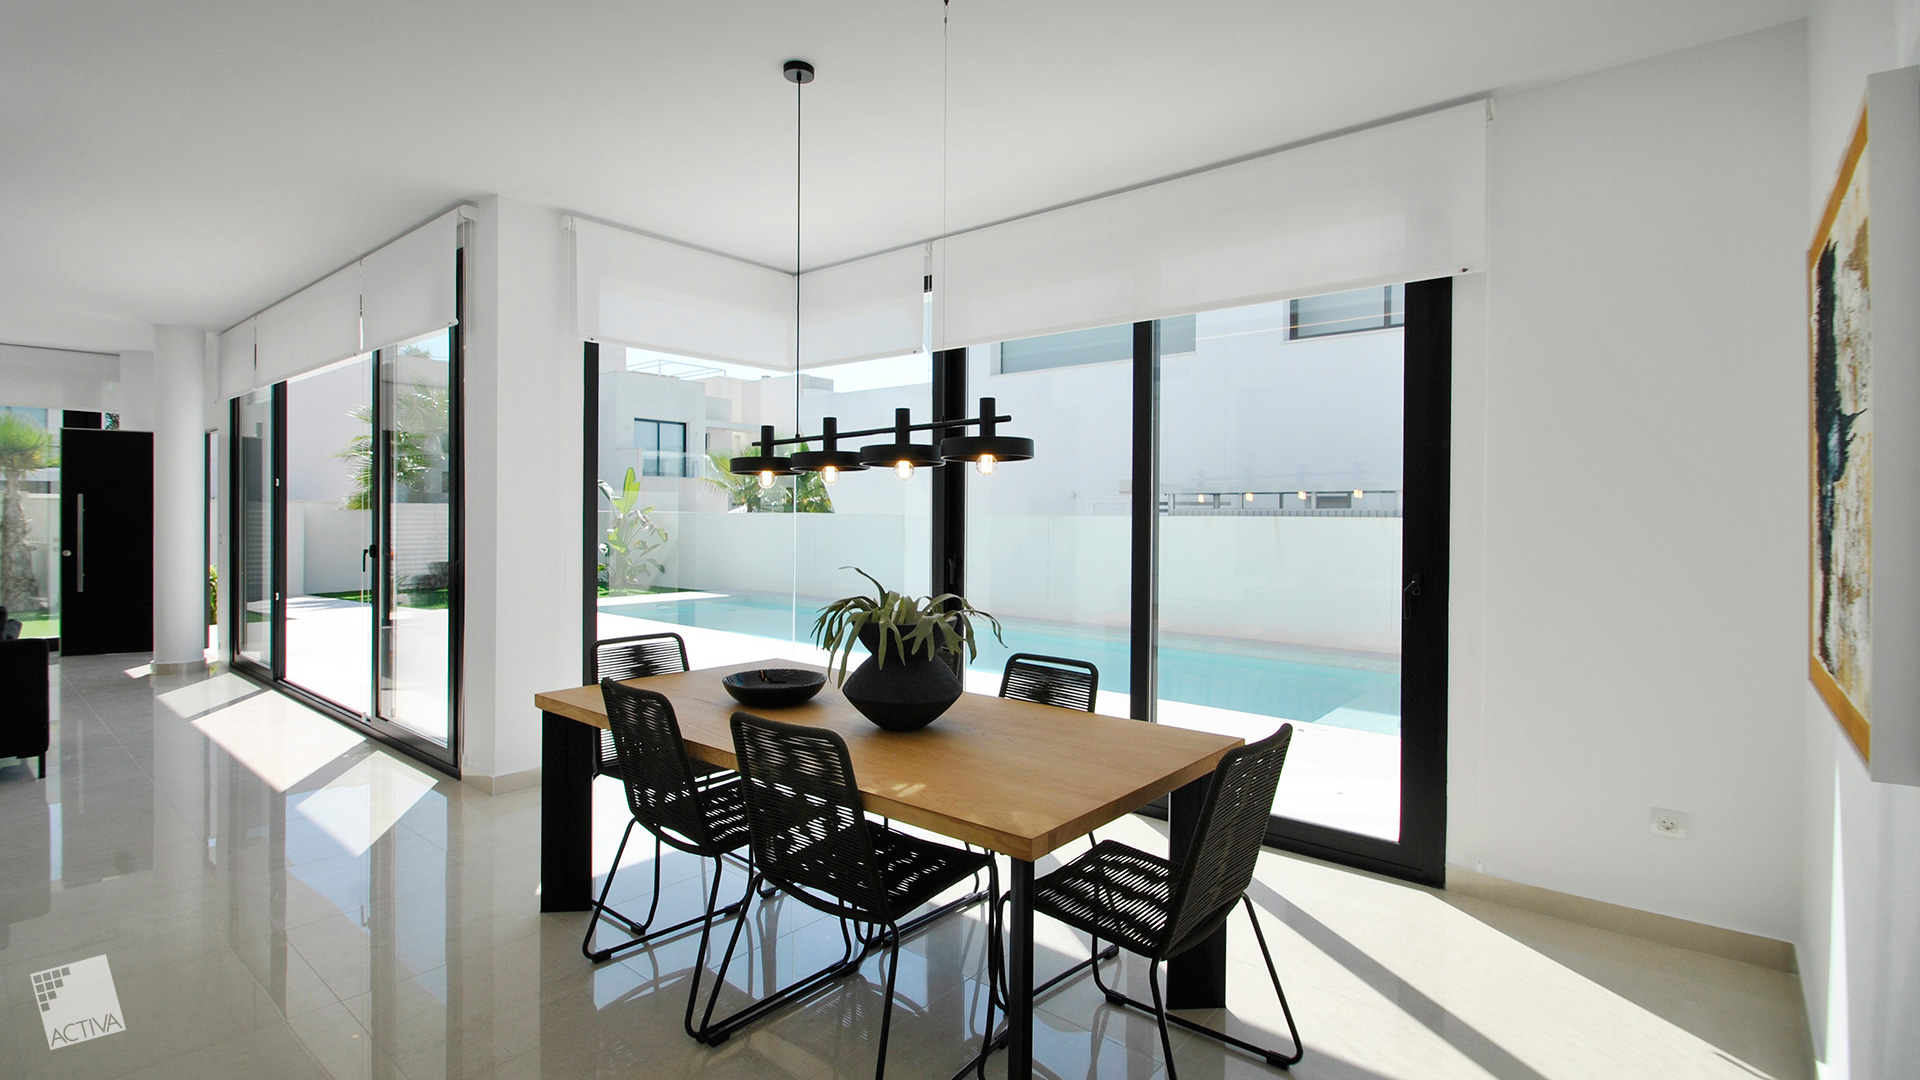 Image Sensational Design Villa in Quesada 2